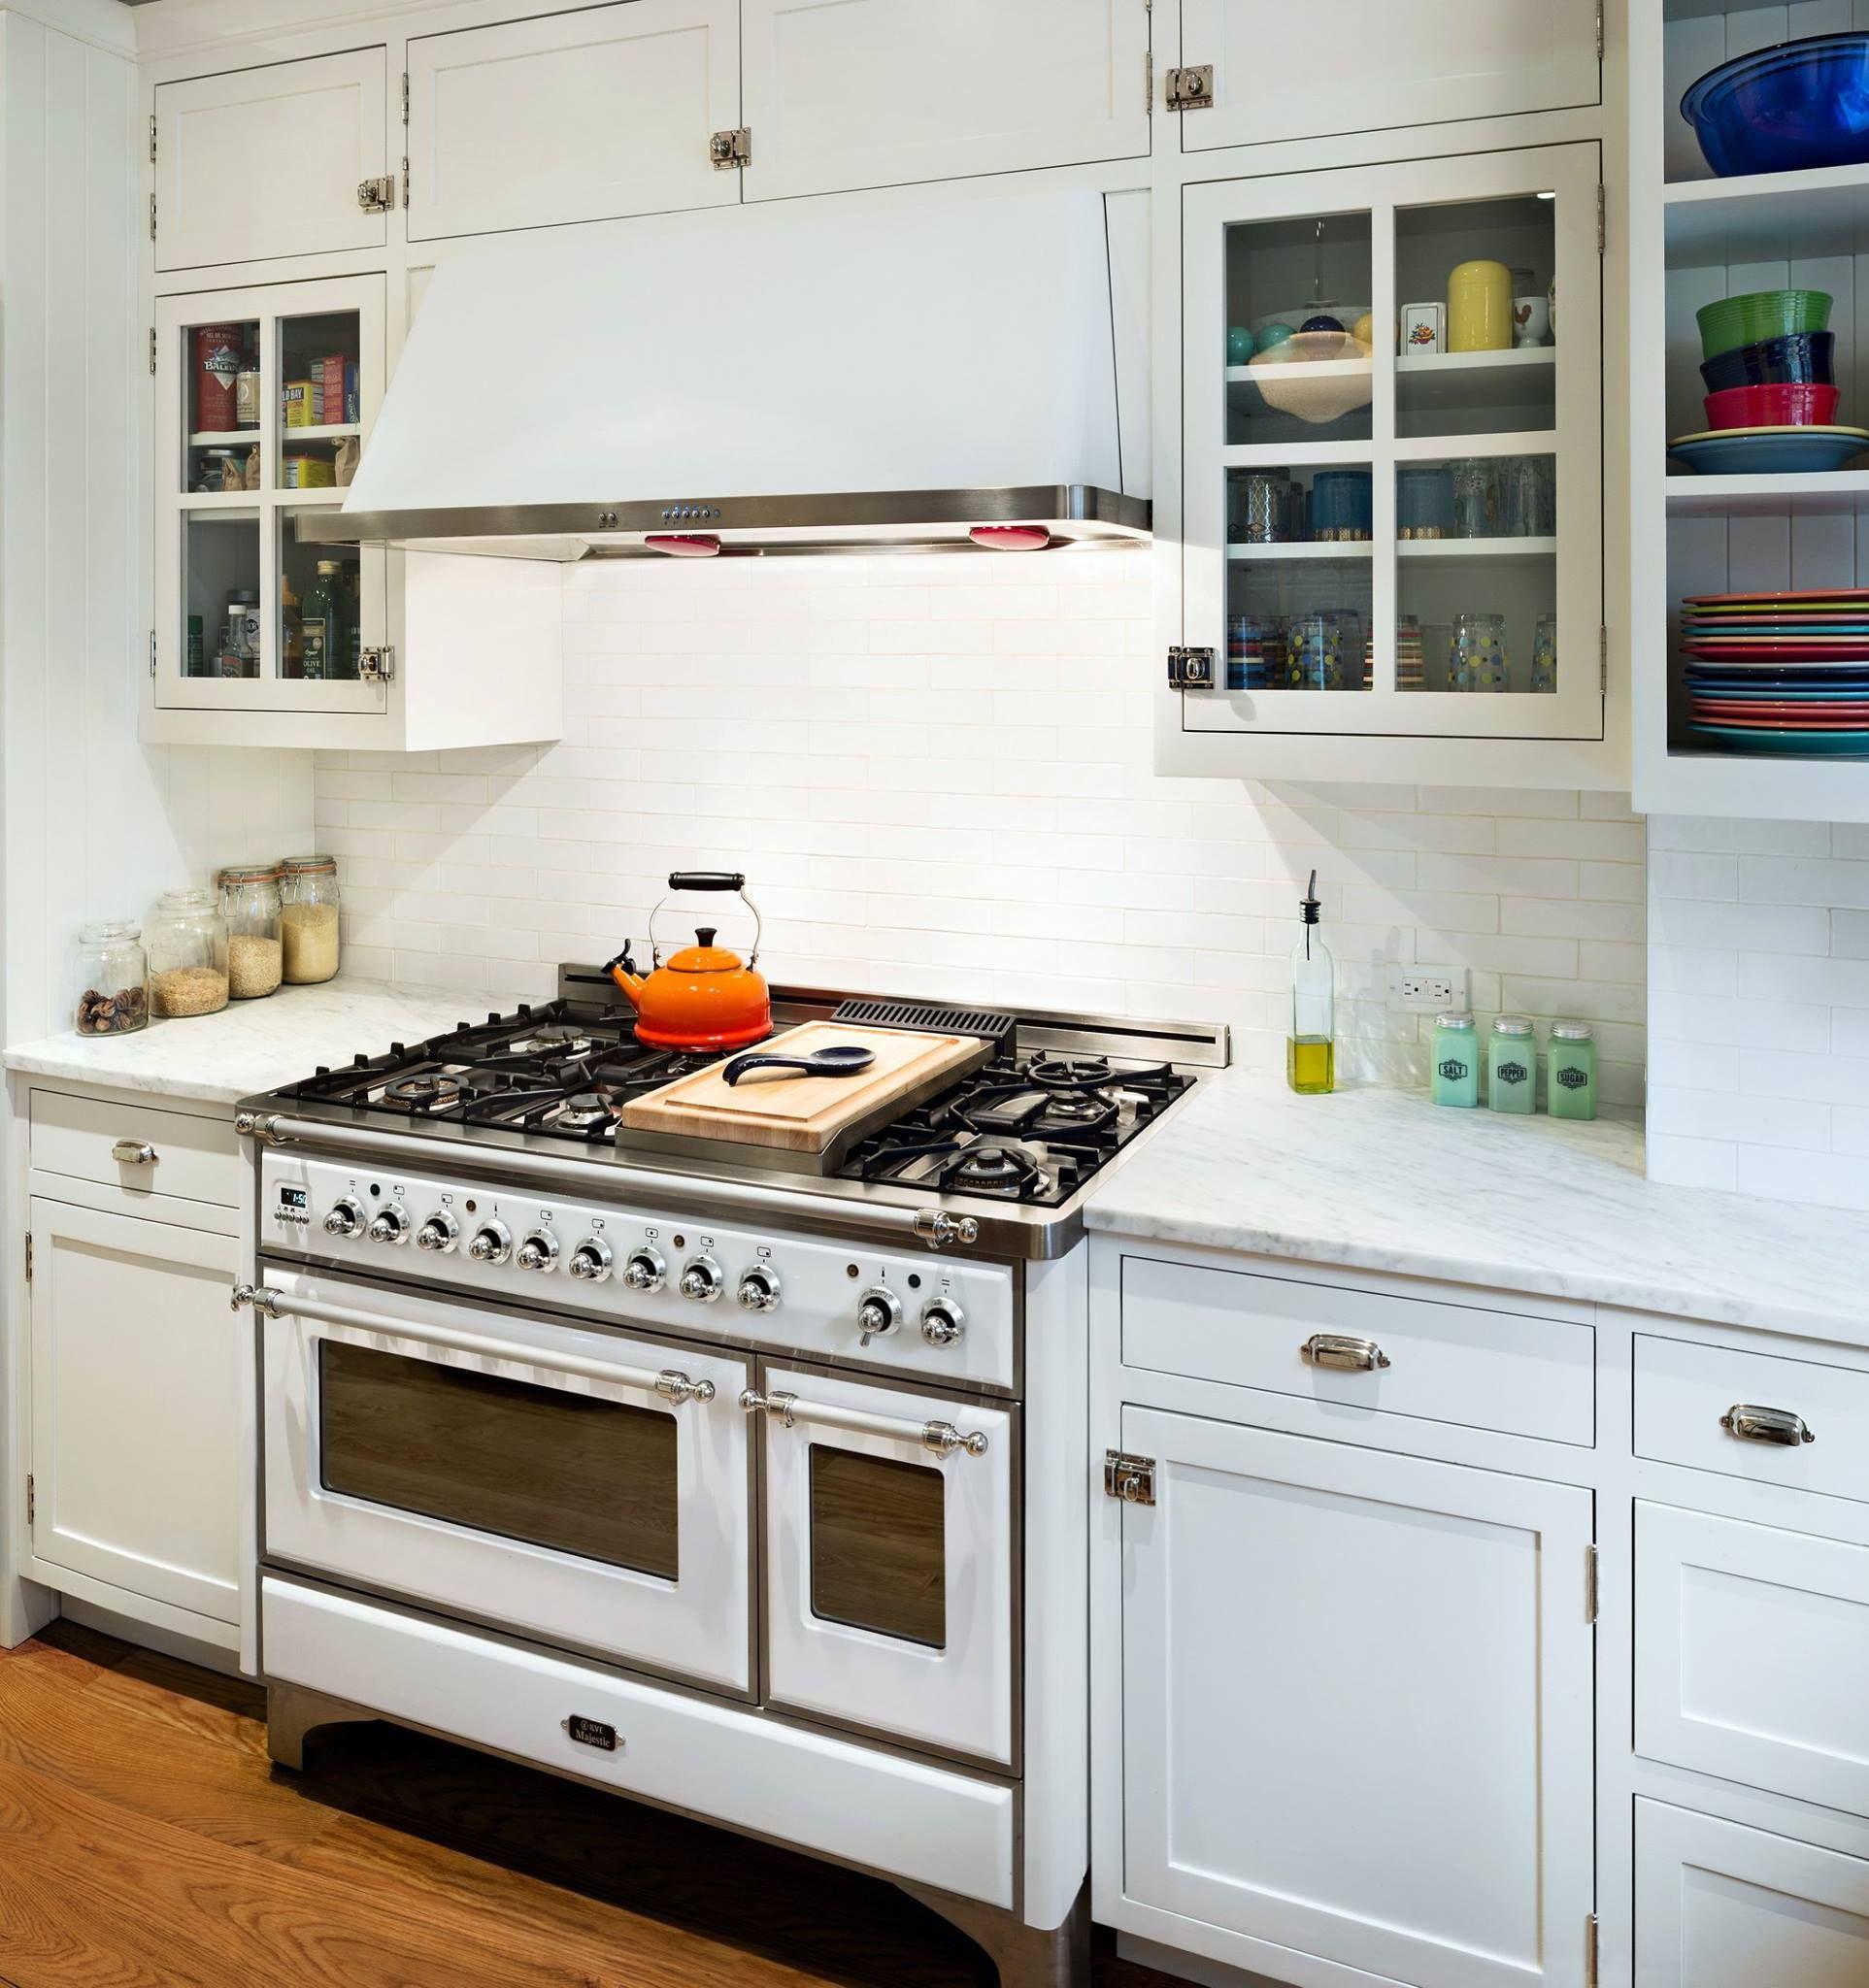 Johann Grobler Architects Designed Our Kitchenoftheweek The Brooklyn Victorian Features The Ilve 40 M Kitchen Design Kitchen New York Shabby Chic Kitchen